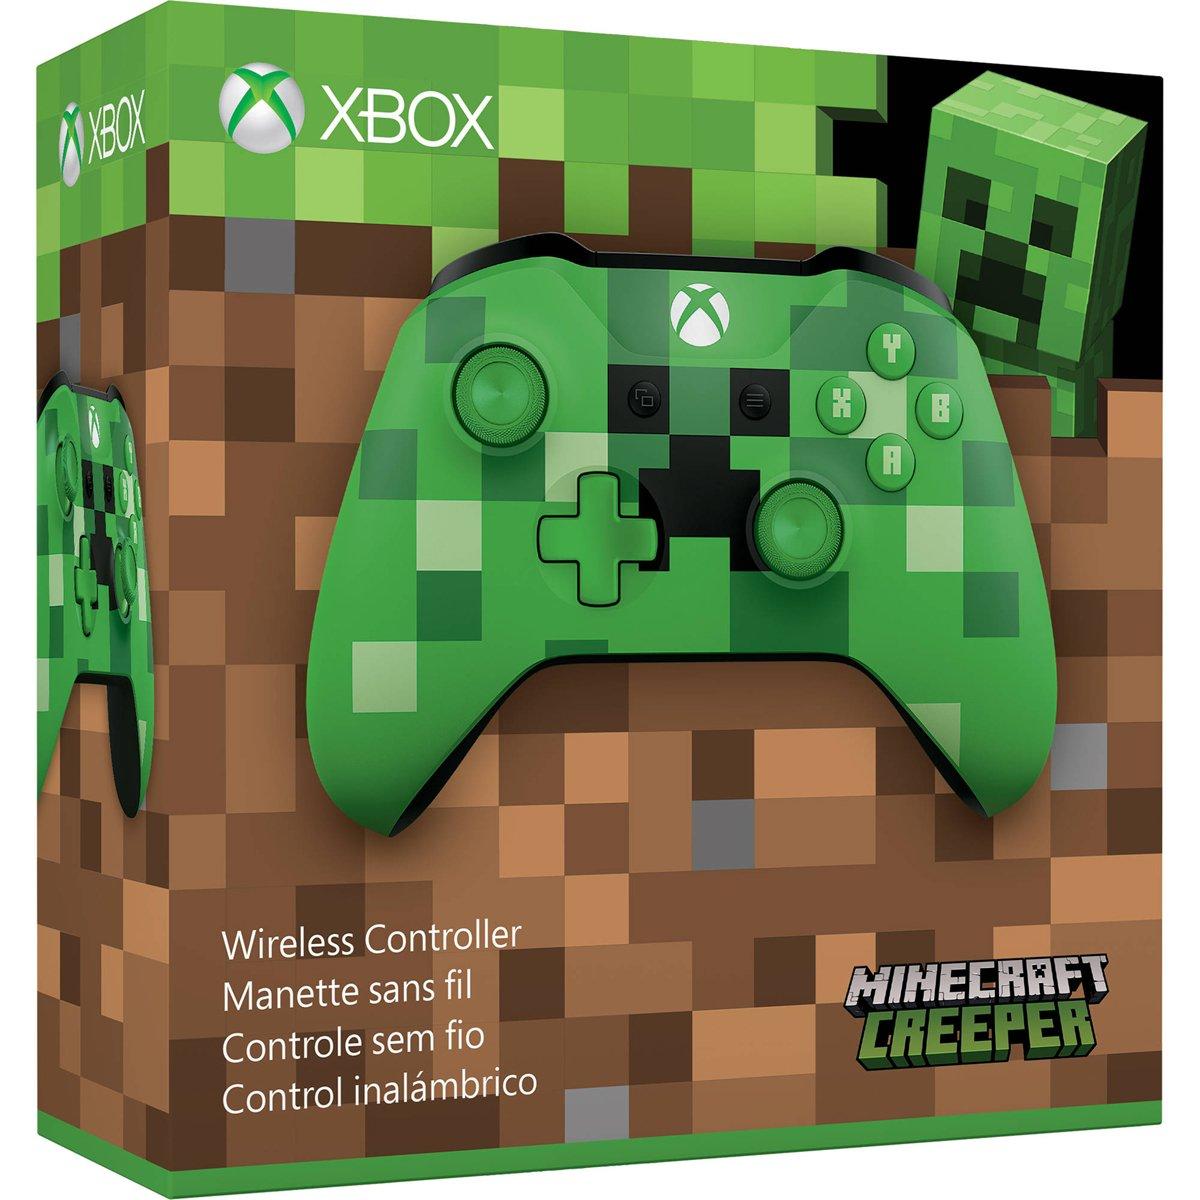 Amazon.com: Microsoft Xbox Wireless Controller - Minecraft Creeper